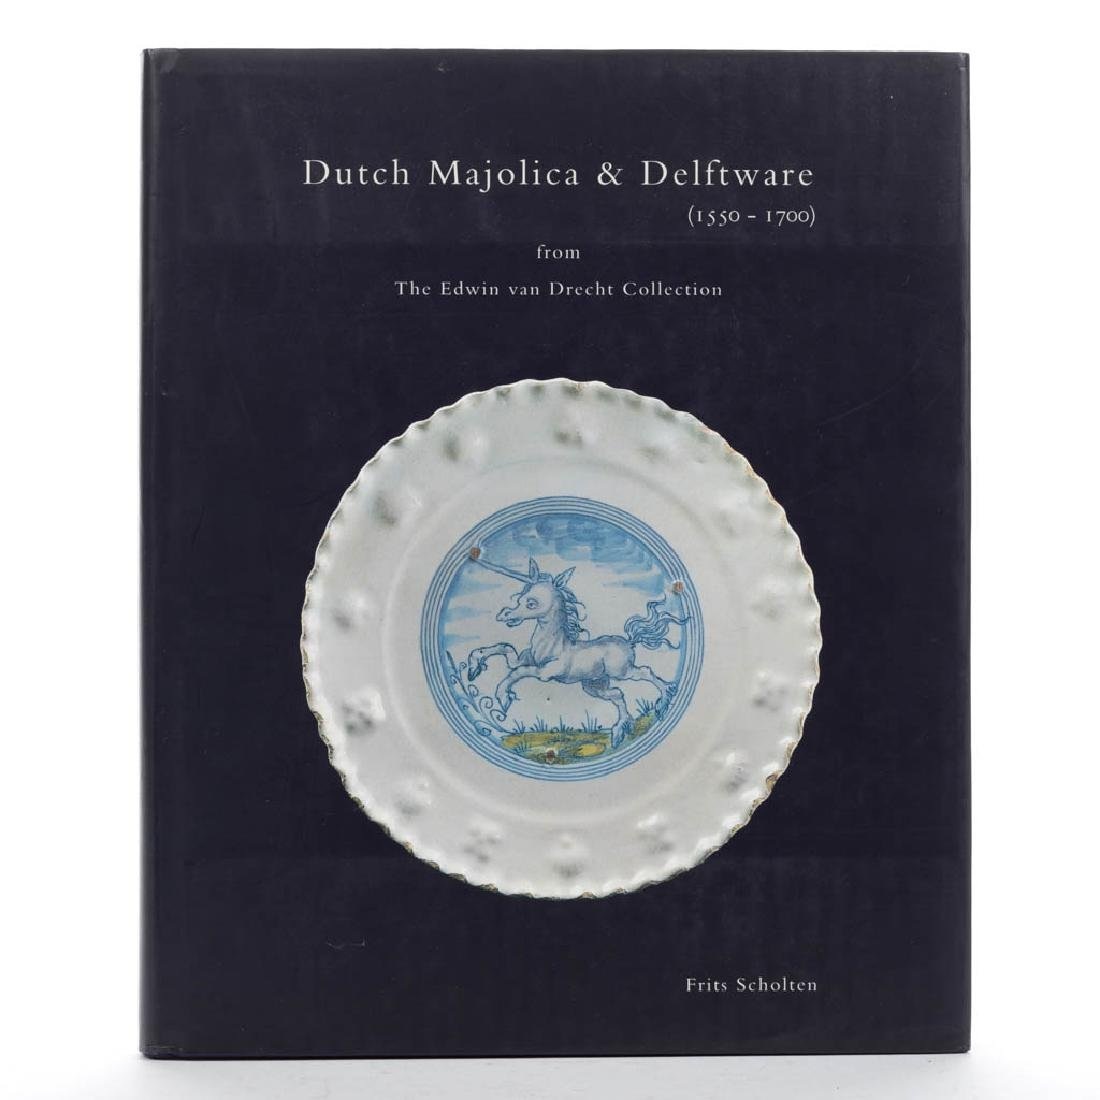 DUTCH DELFT / MAJOLICA CERAMIC VOLUME